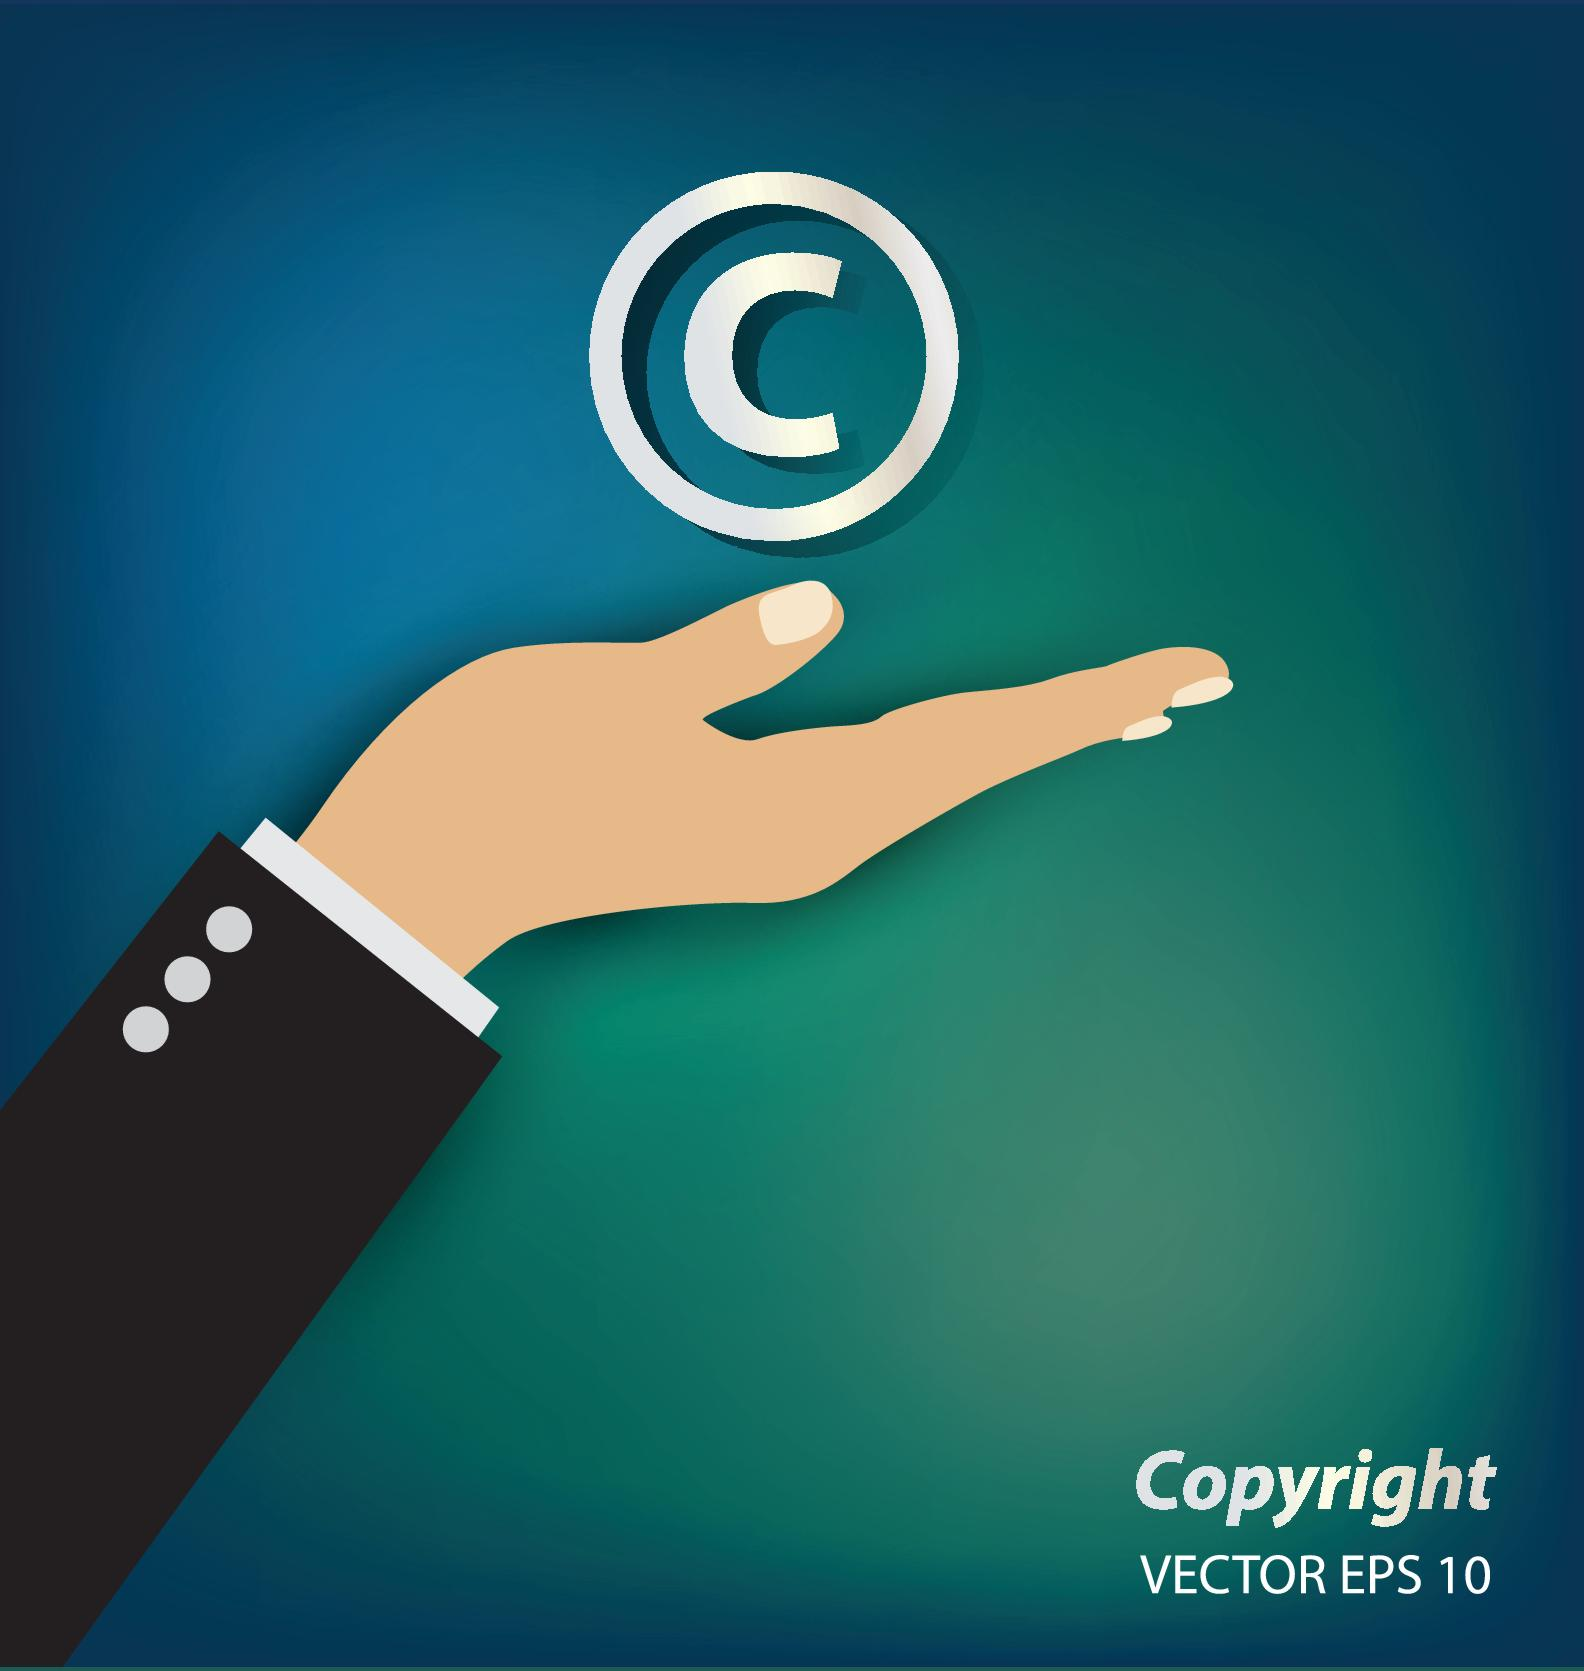 205vq41rb0kqq16 Creative copyright business vector design 01